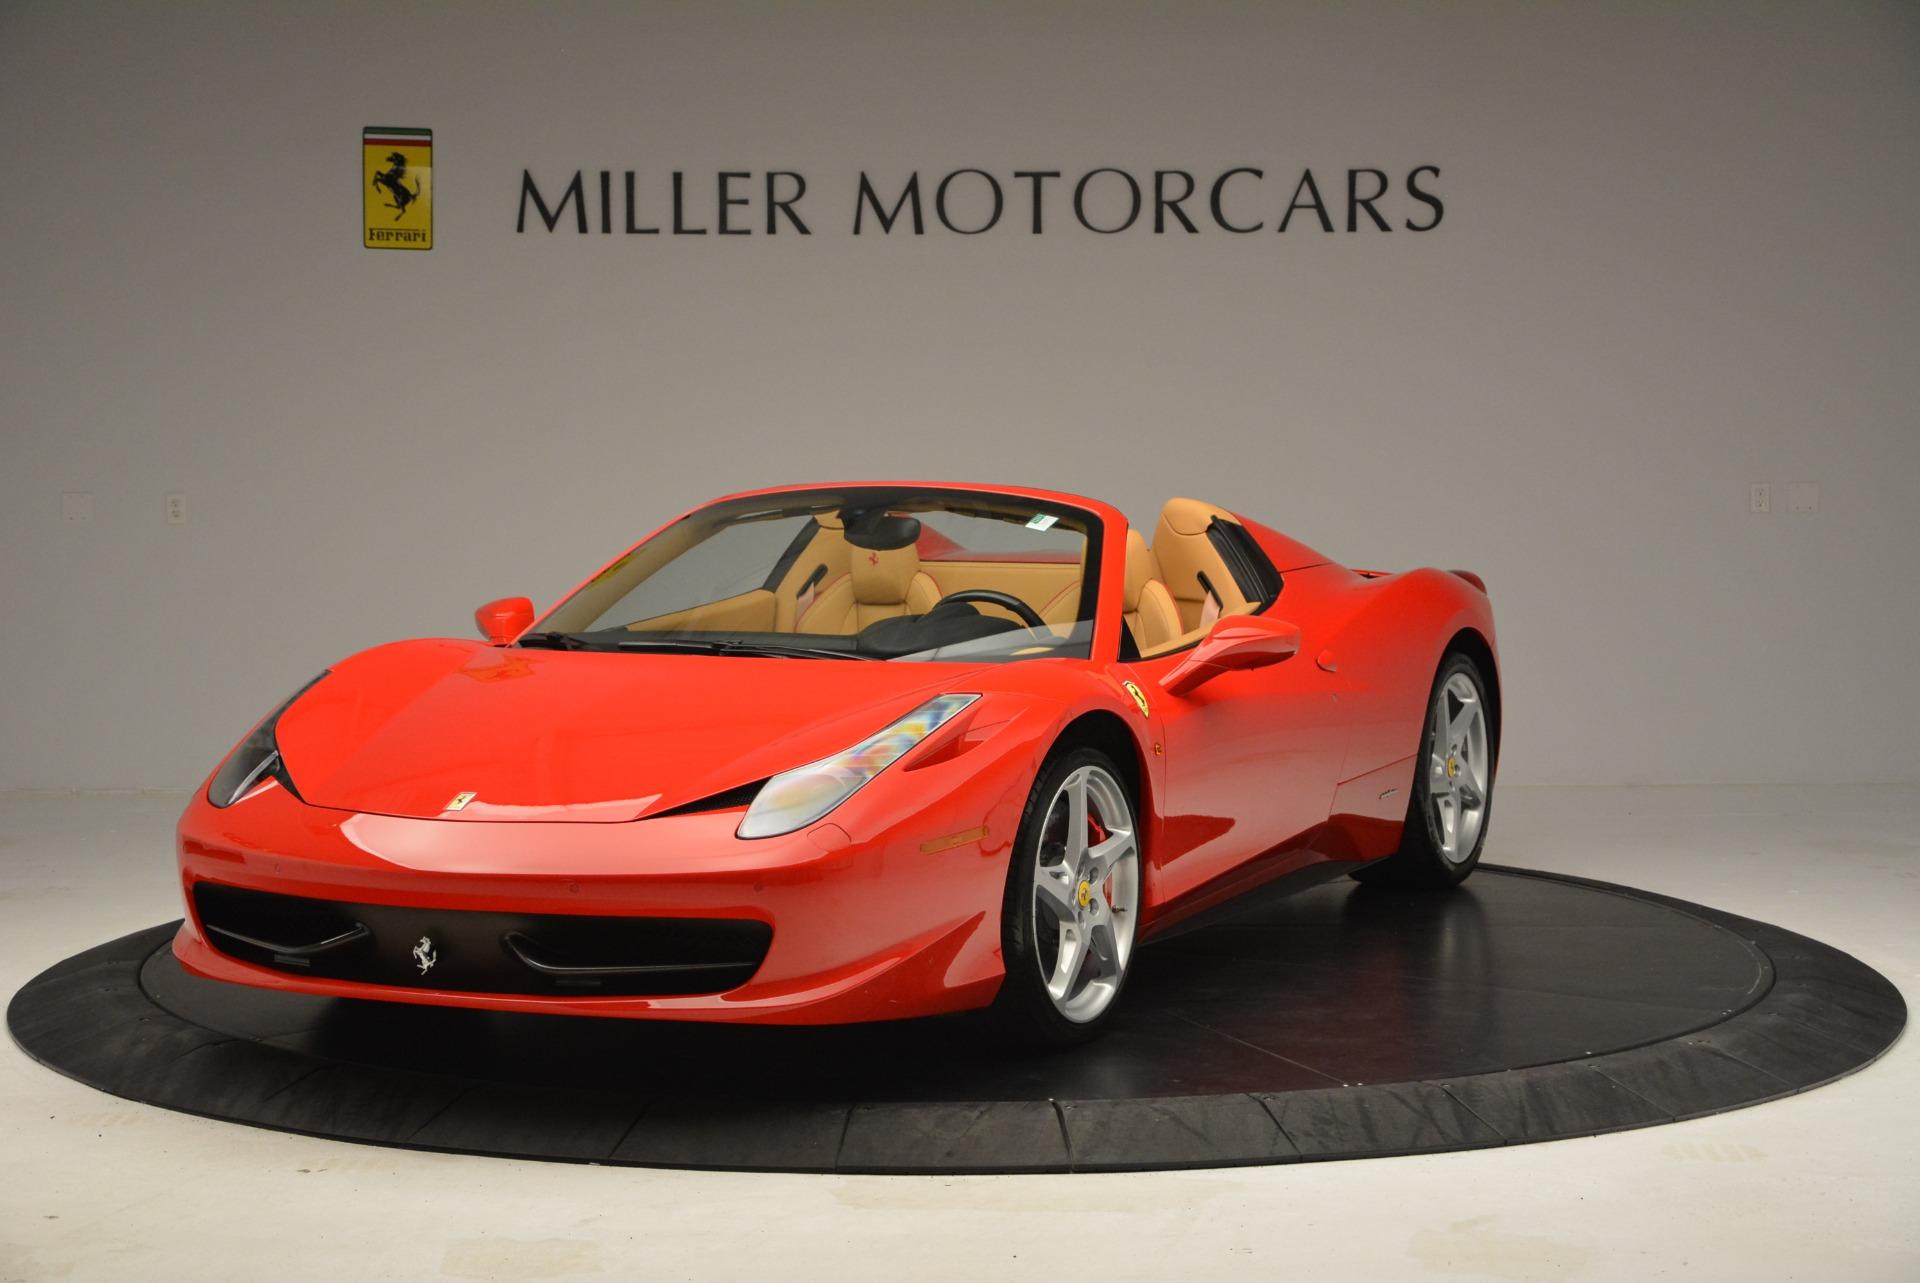 Used 2013 Ferrari 458 Spider for sale Sold at Alfa Romeo of Greenwich in Greenwich CT 06830 1